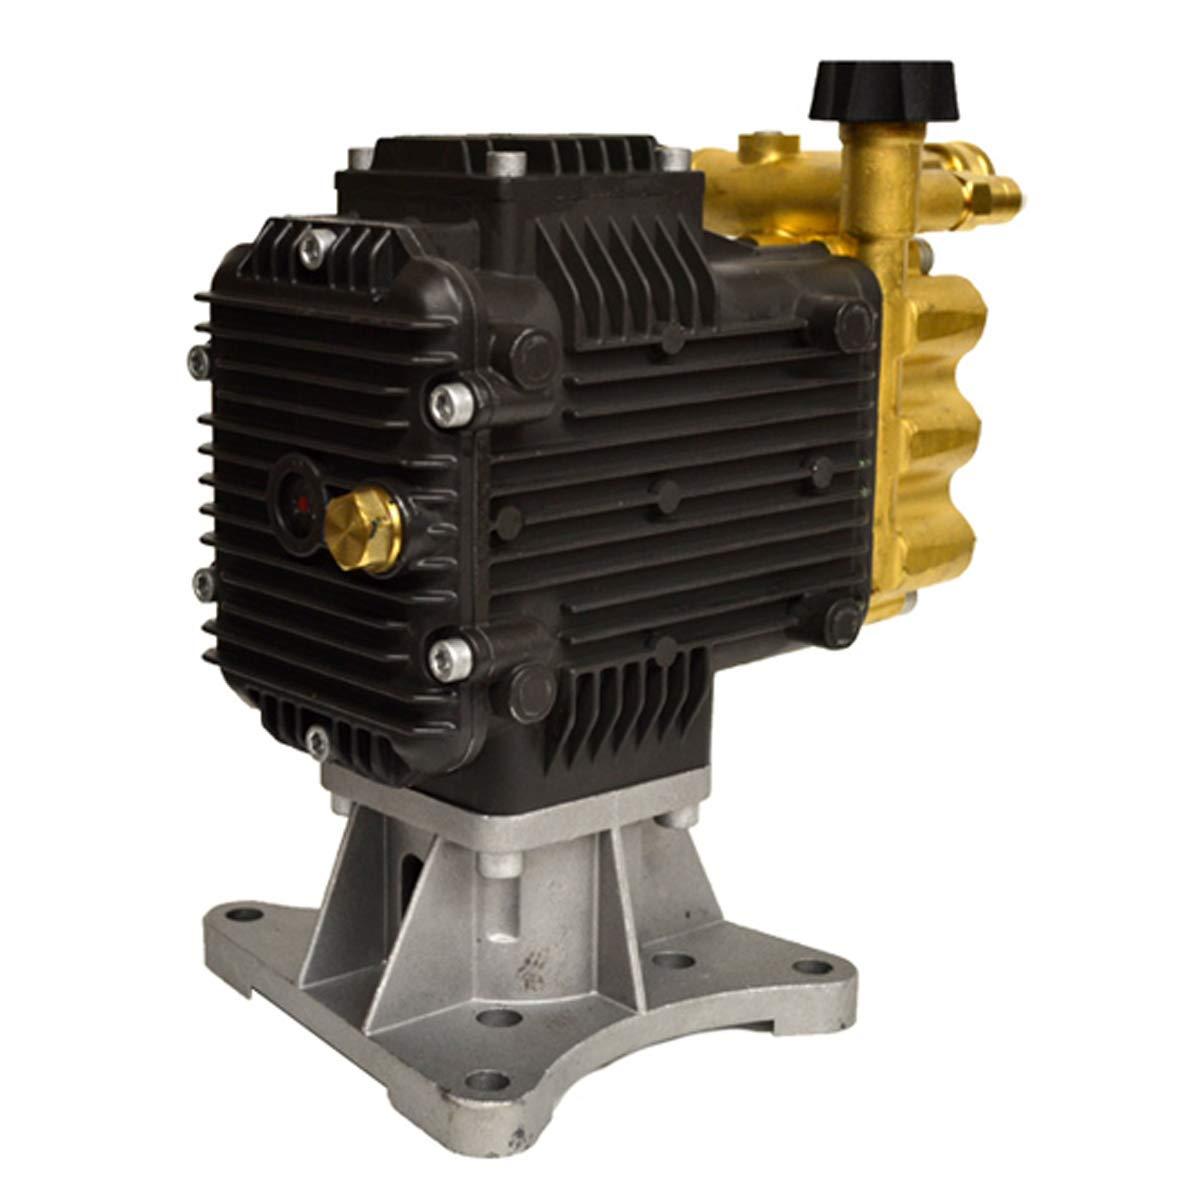 4000 PSI Anonovi Revereri Cat RRV4G40 & RSV4G40HDF40EZ 4GPM Replacement Pressure Washer Pump 1'' Fits Honda Engine, Troy Bilt, Coleman & Generac Excel